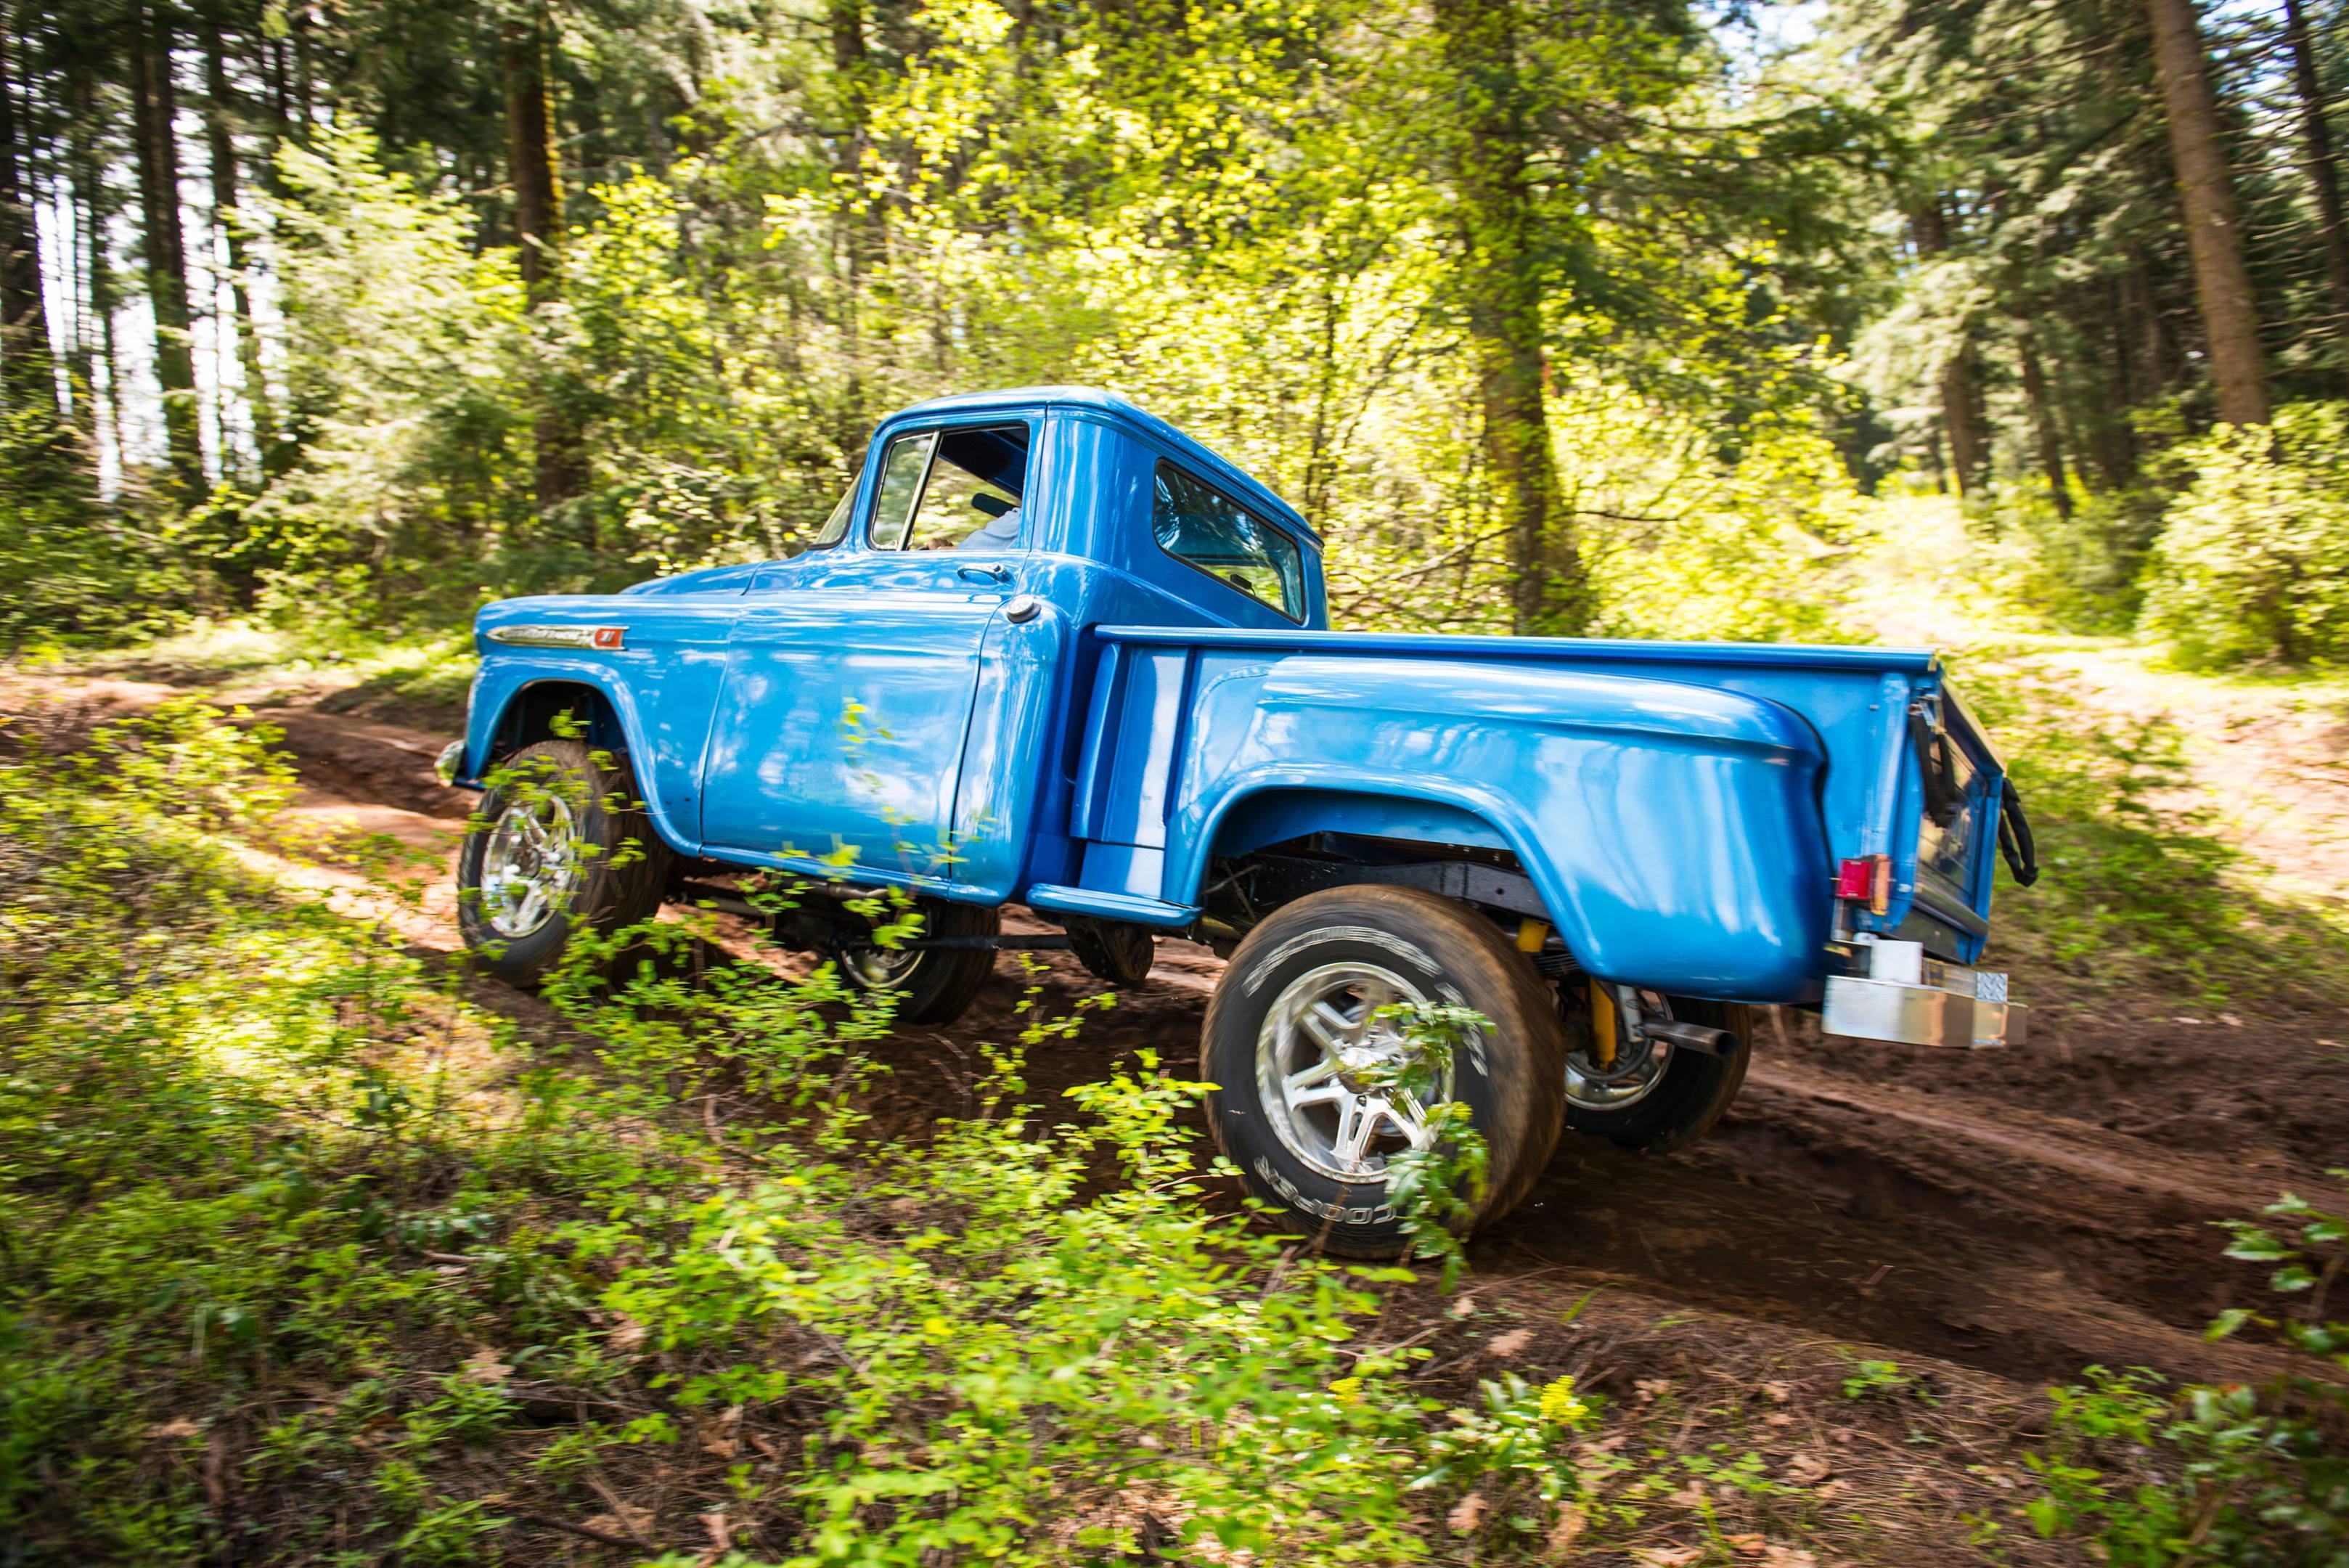 Chevrolet 4x4 truck